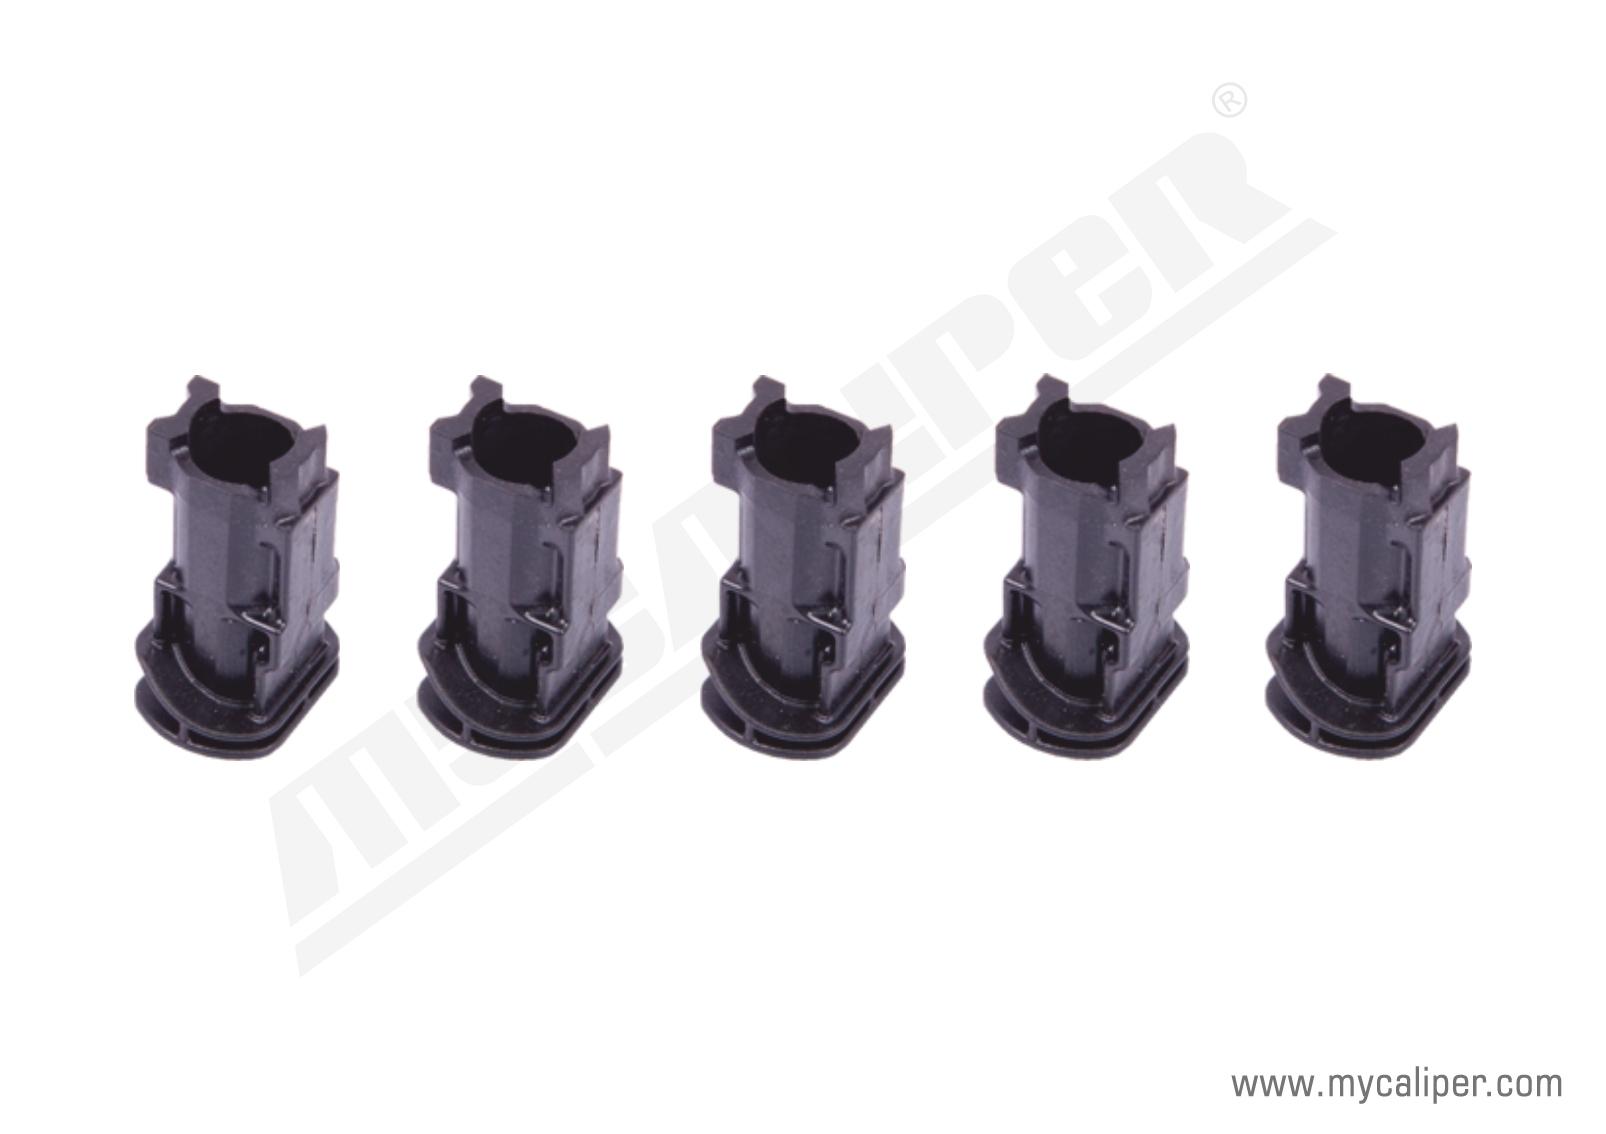 Caliper Mechanism Locking Plastic Kit